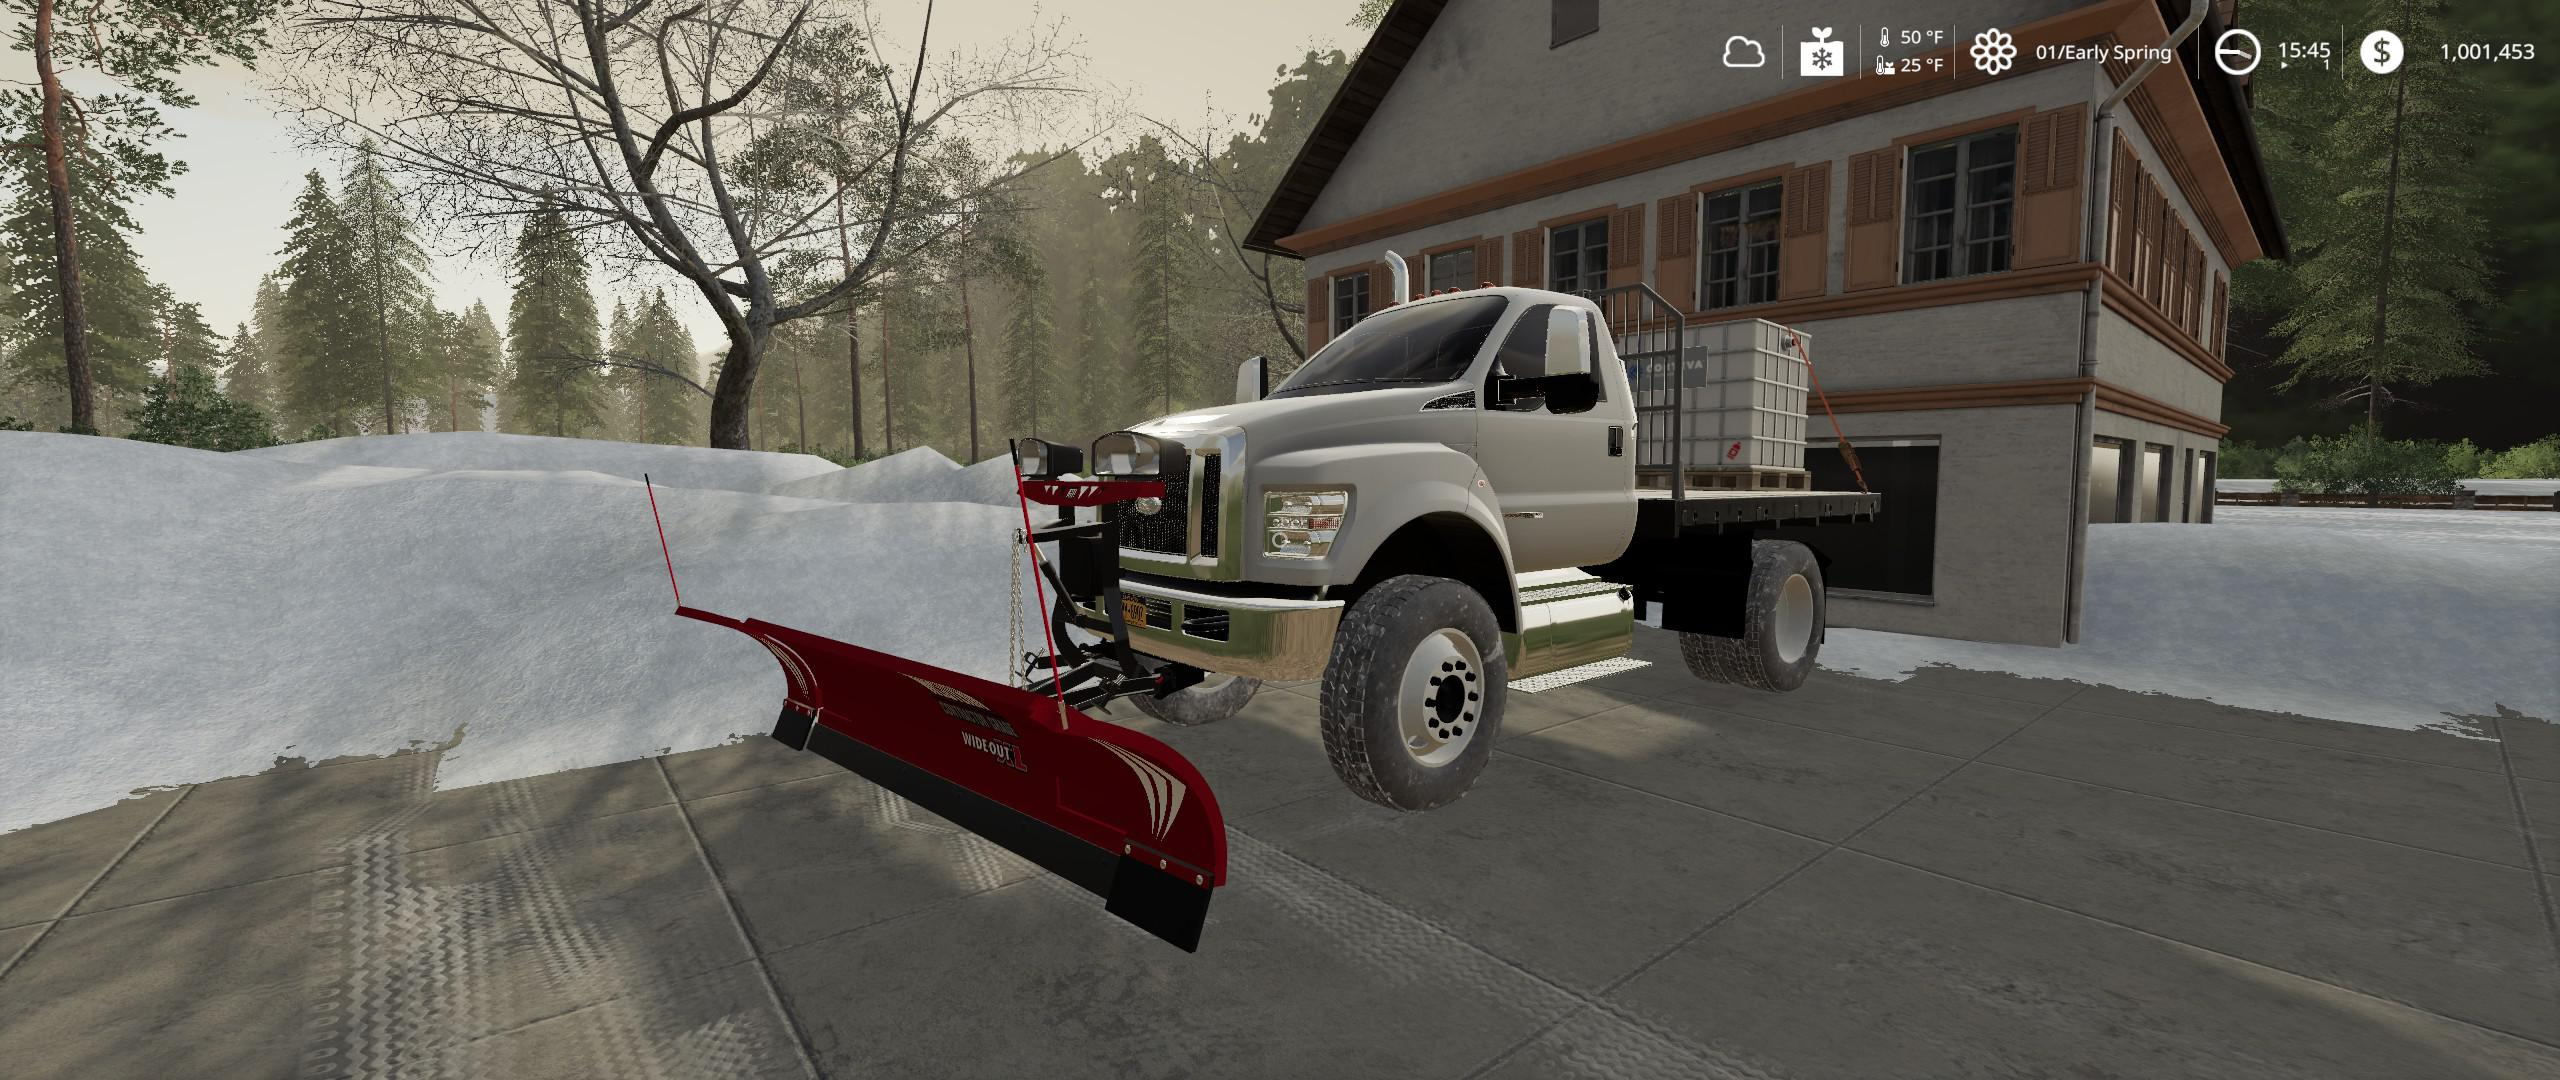 Ford F750 Flatbed Plow Truck v1 0 LS19 - Farming Simulator